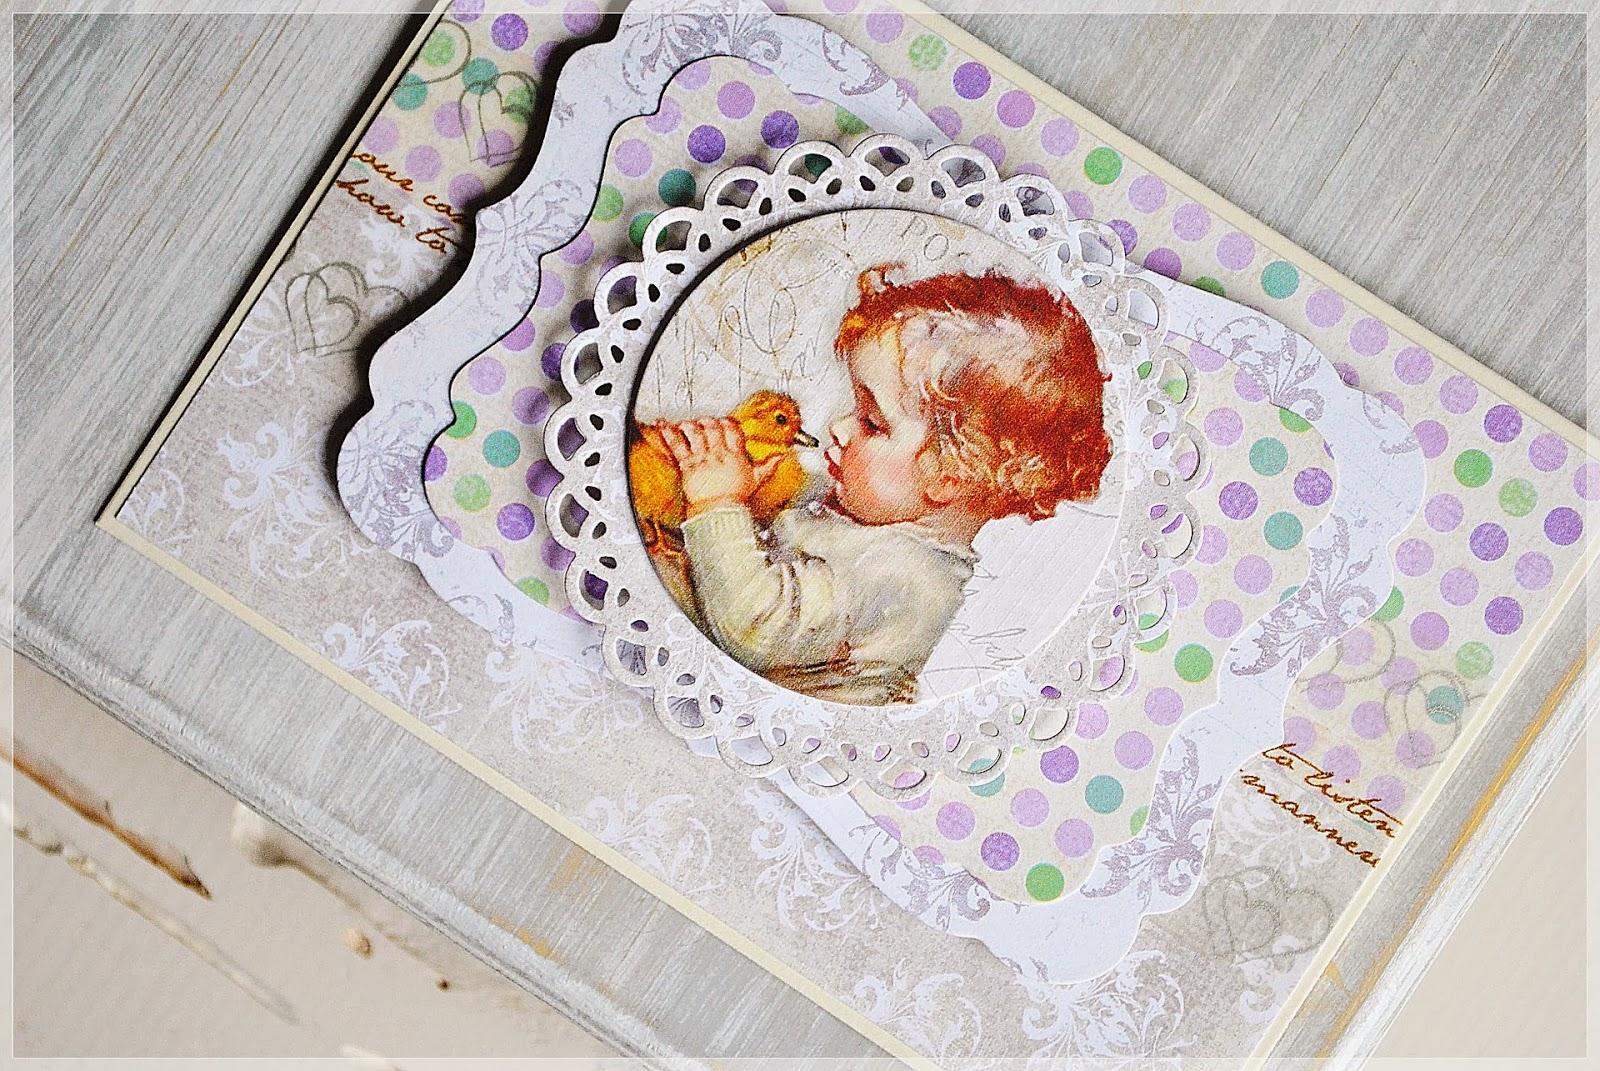 kartka dla dziecka scrapbooking